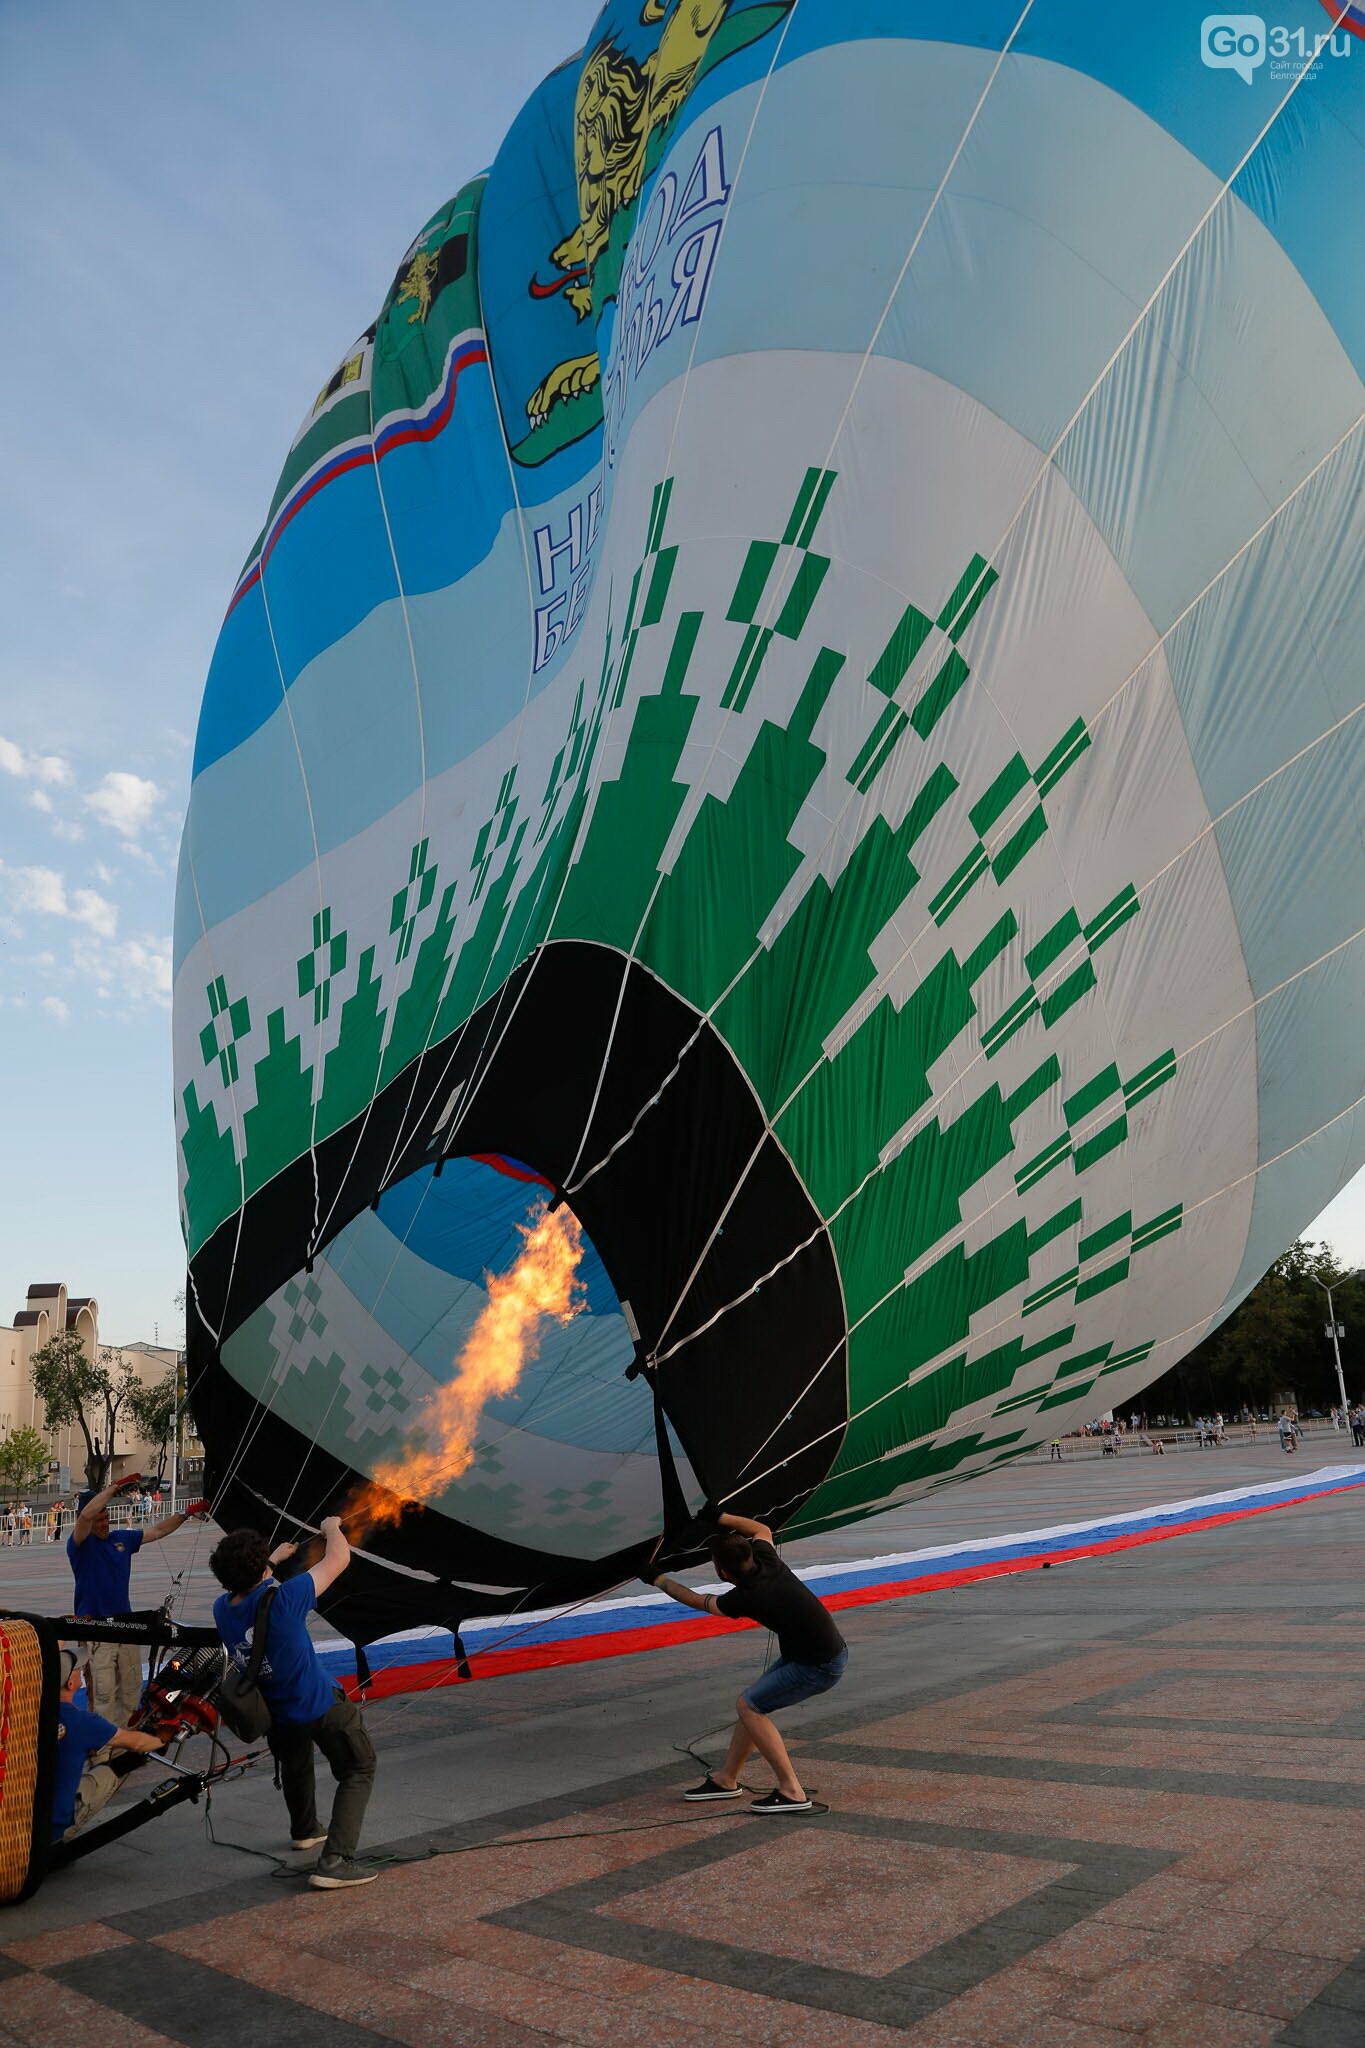 Над Белгородом пролетел аэростат с гигантским триколором, фото-16, Фото: Антон Вергун